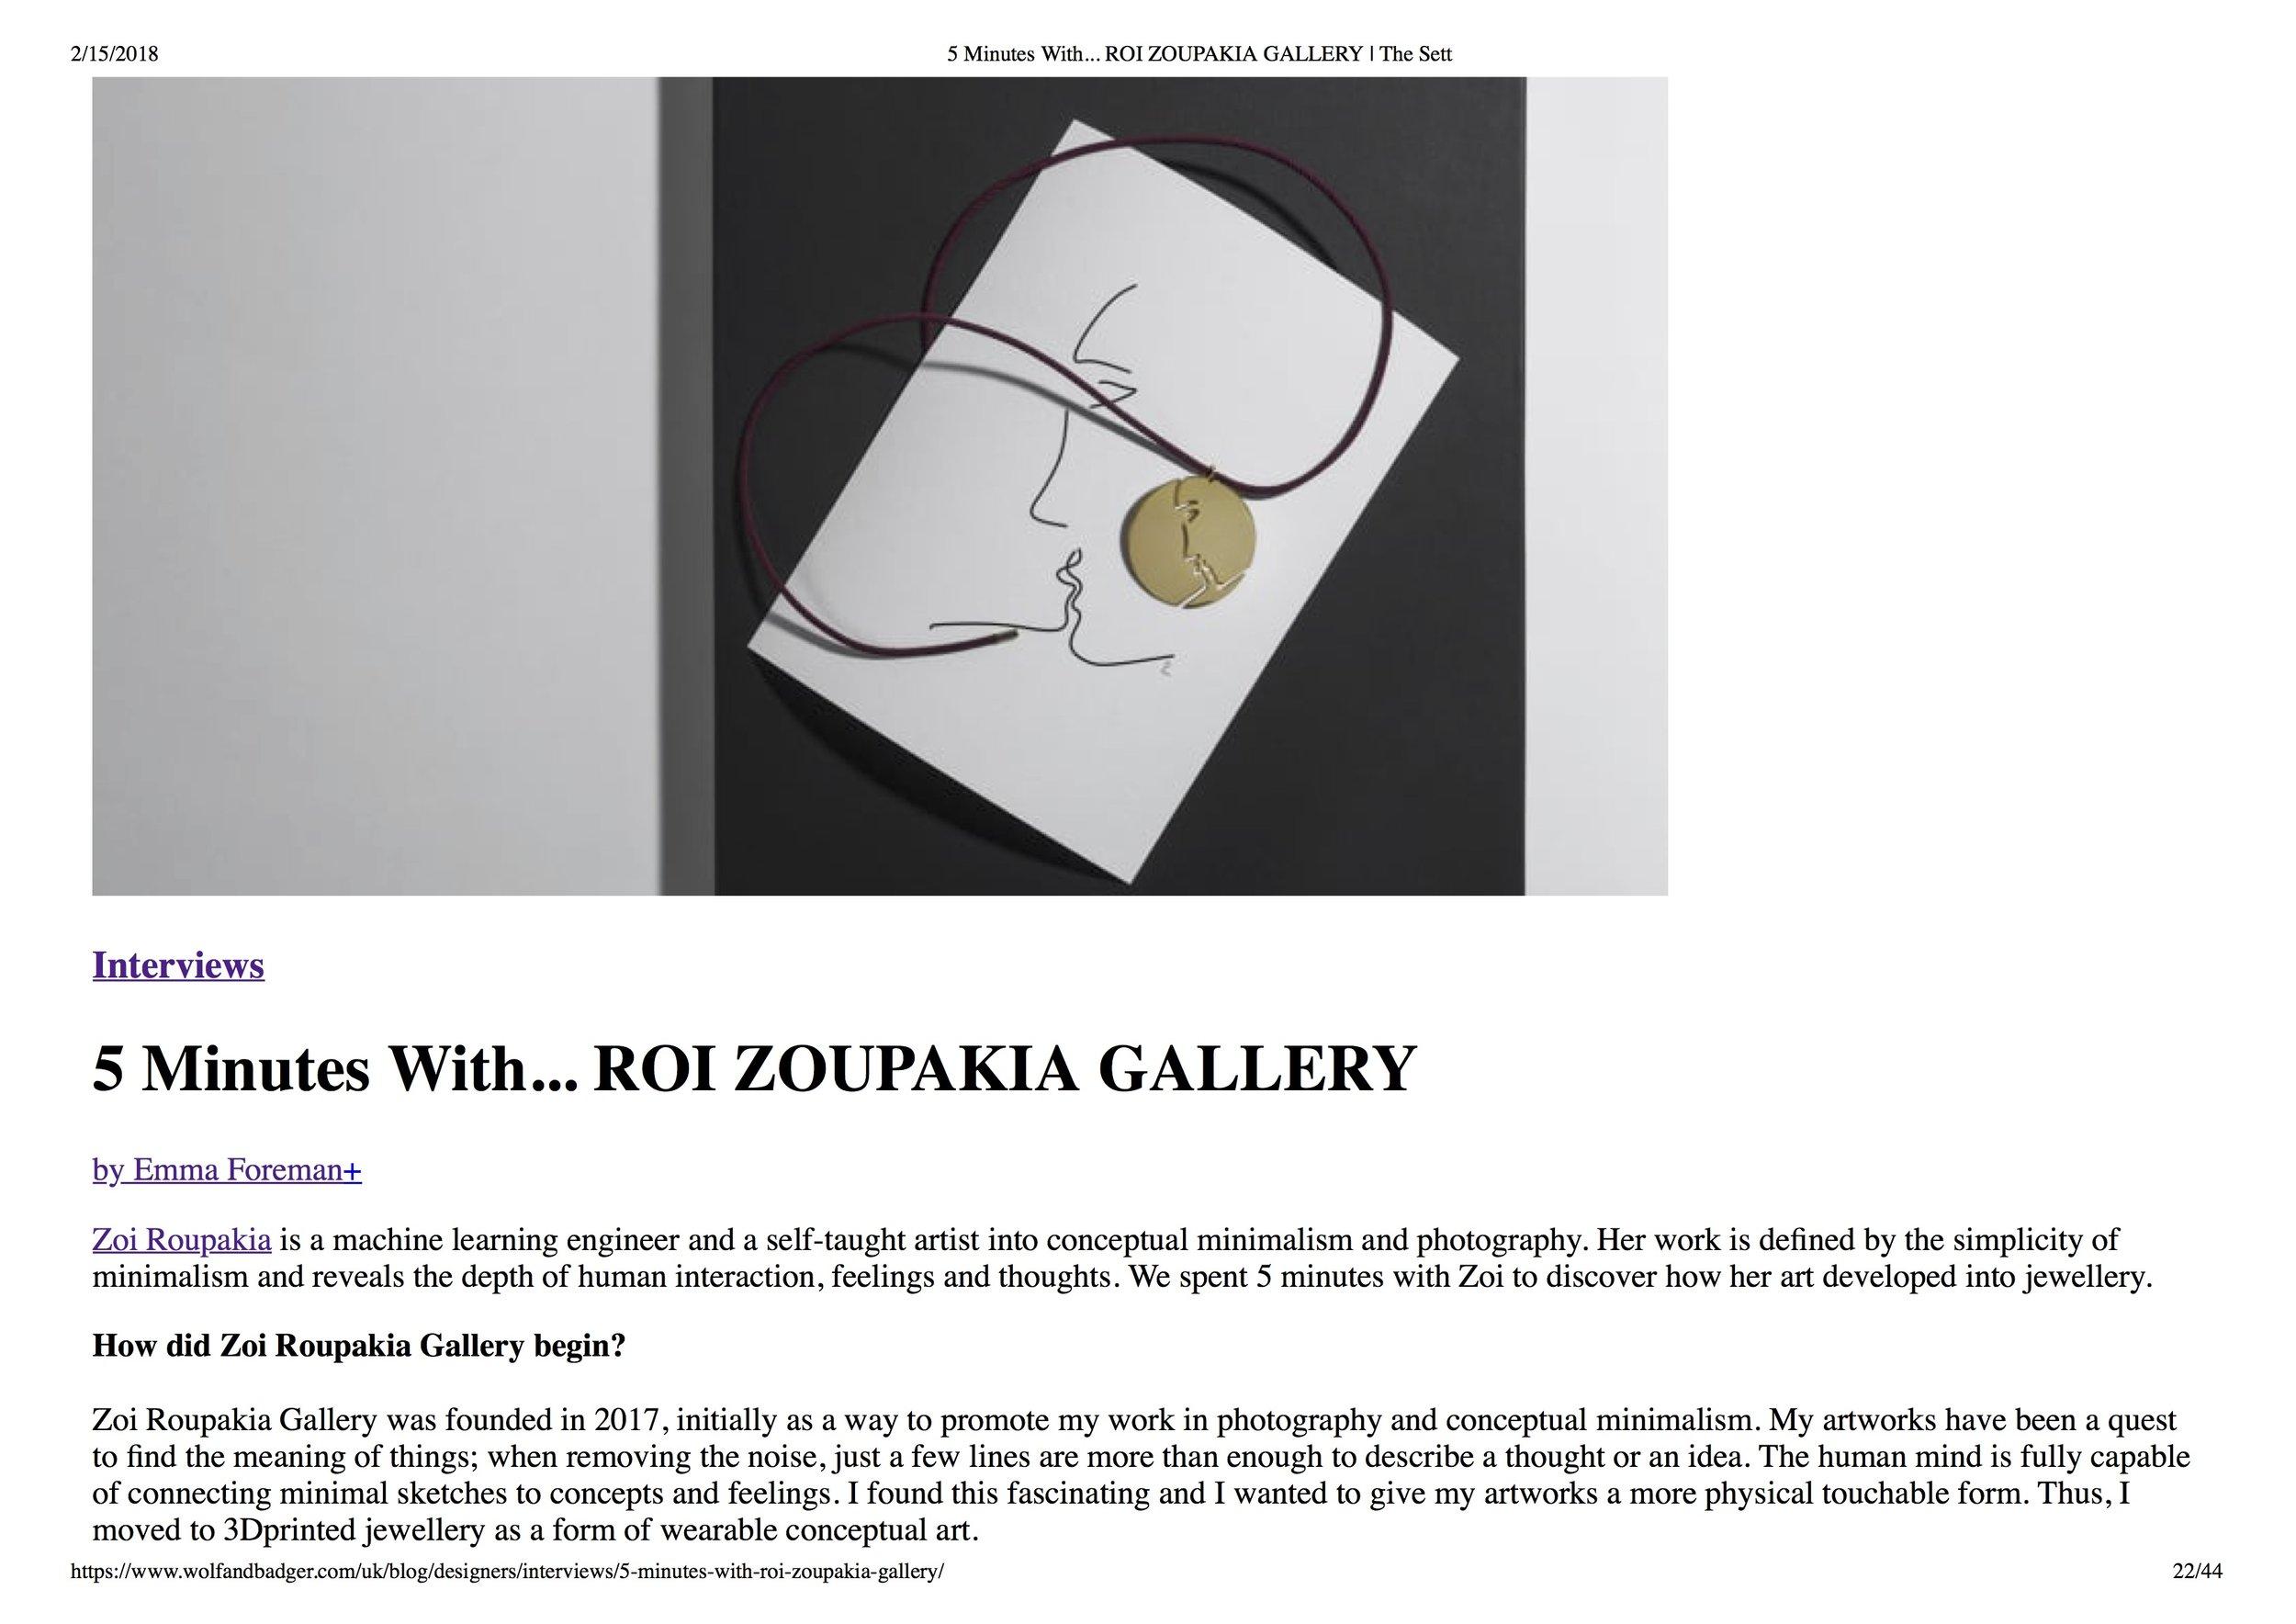 1.5 Minutes With... ROI ZOUPAKIA GALLERY | The Sett.jpg